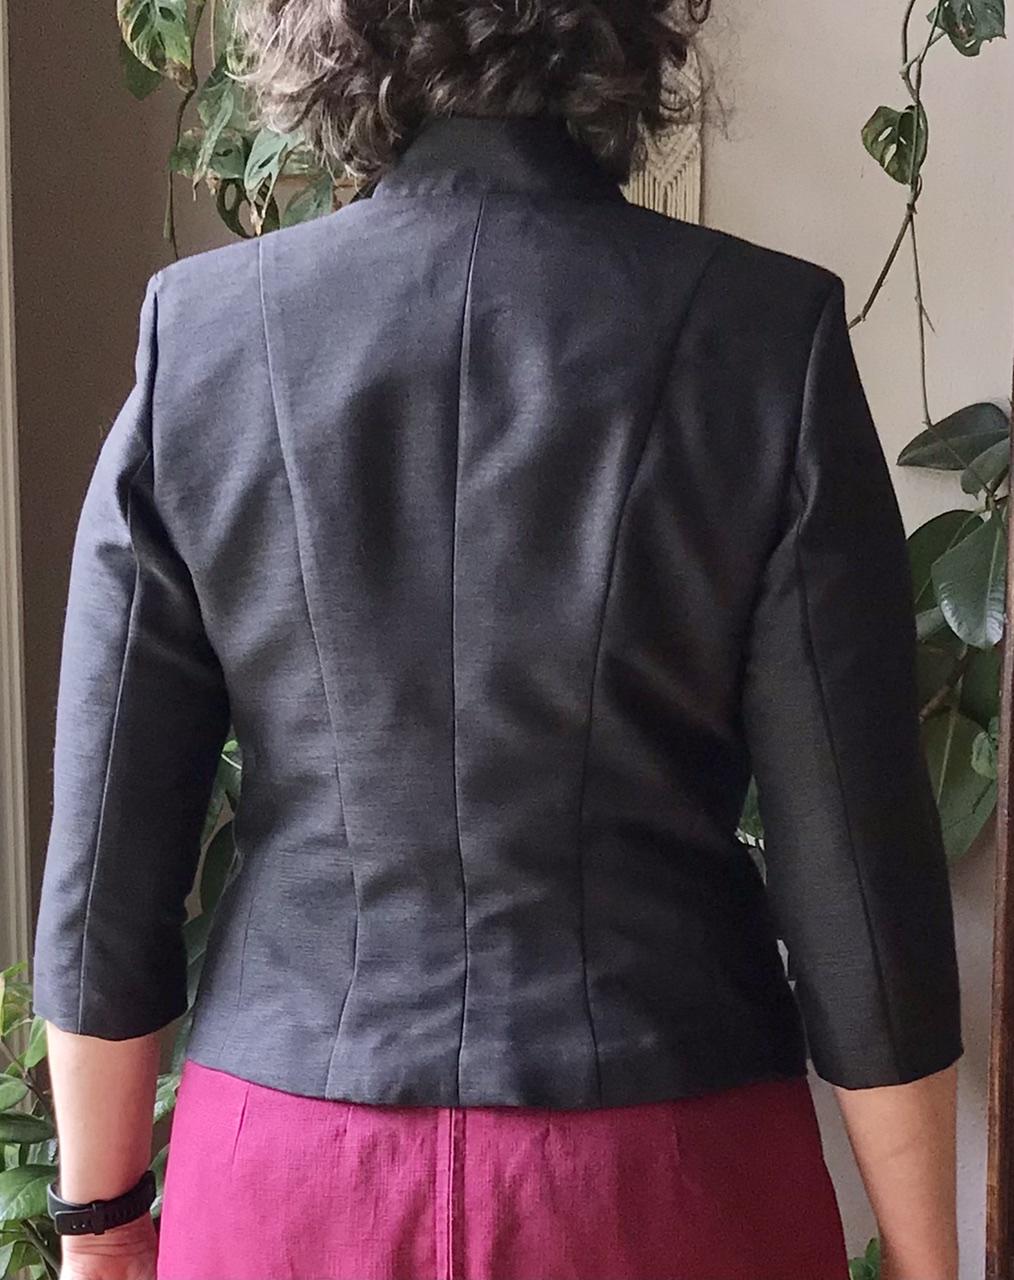 E14 - Kurze Jacke mit Stehkragen hinten - Ceri